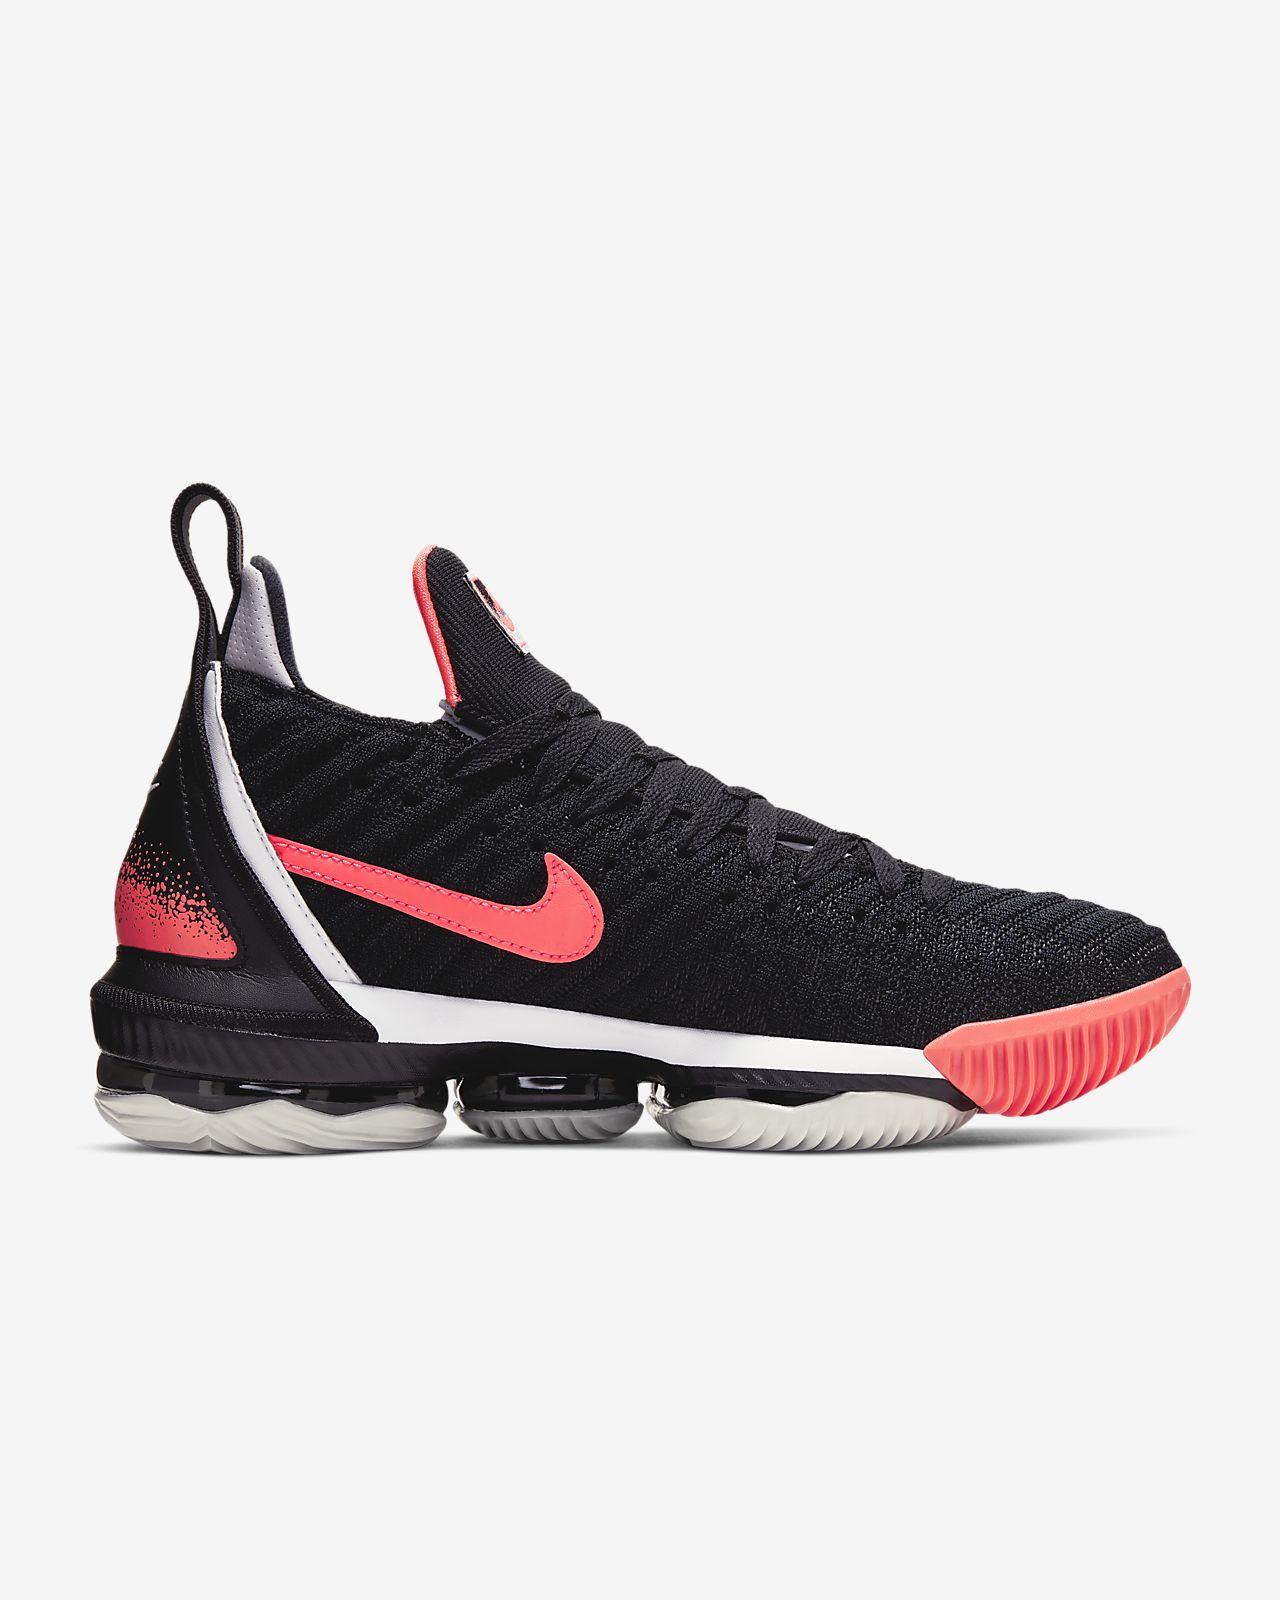 5d29eca0a9e84 LeBron XVI Hot Lava Shoe